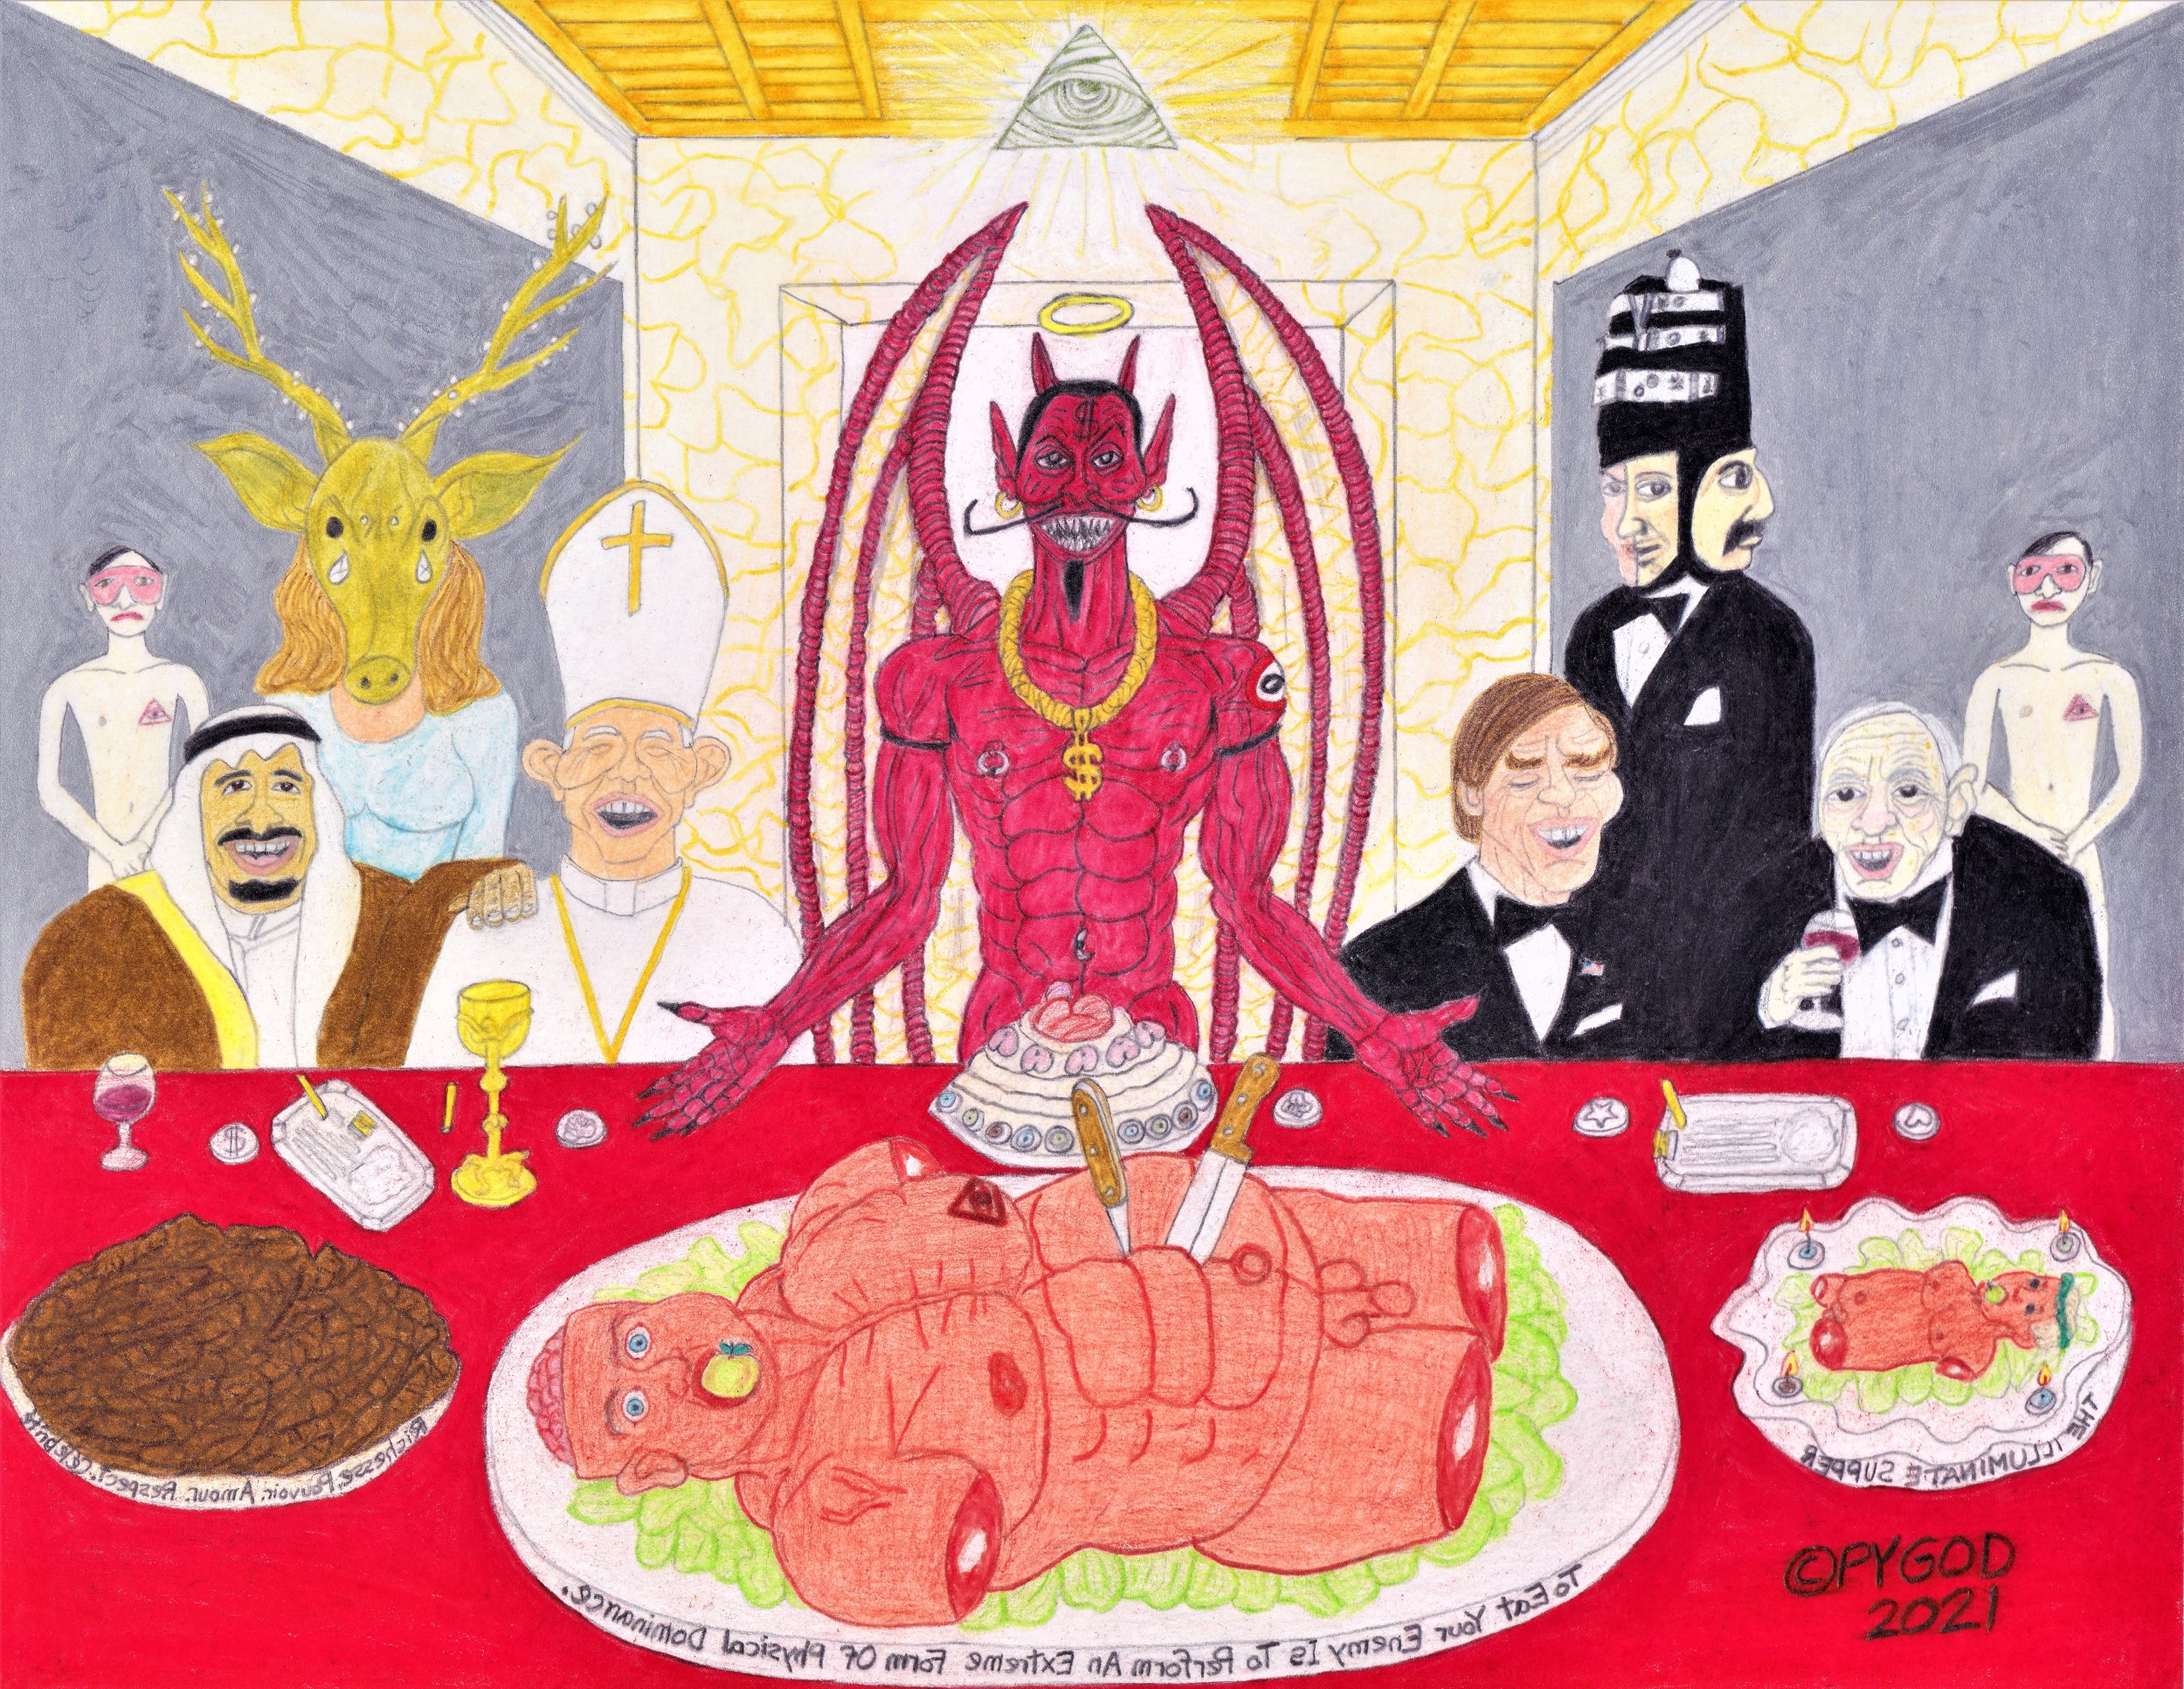 The Illuminati Supper (May 29, 2021) SatansSchlongs.com